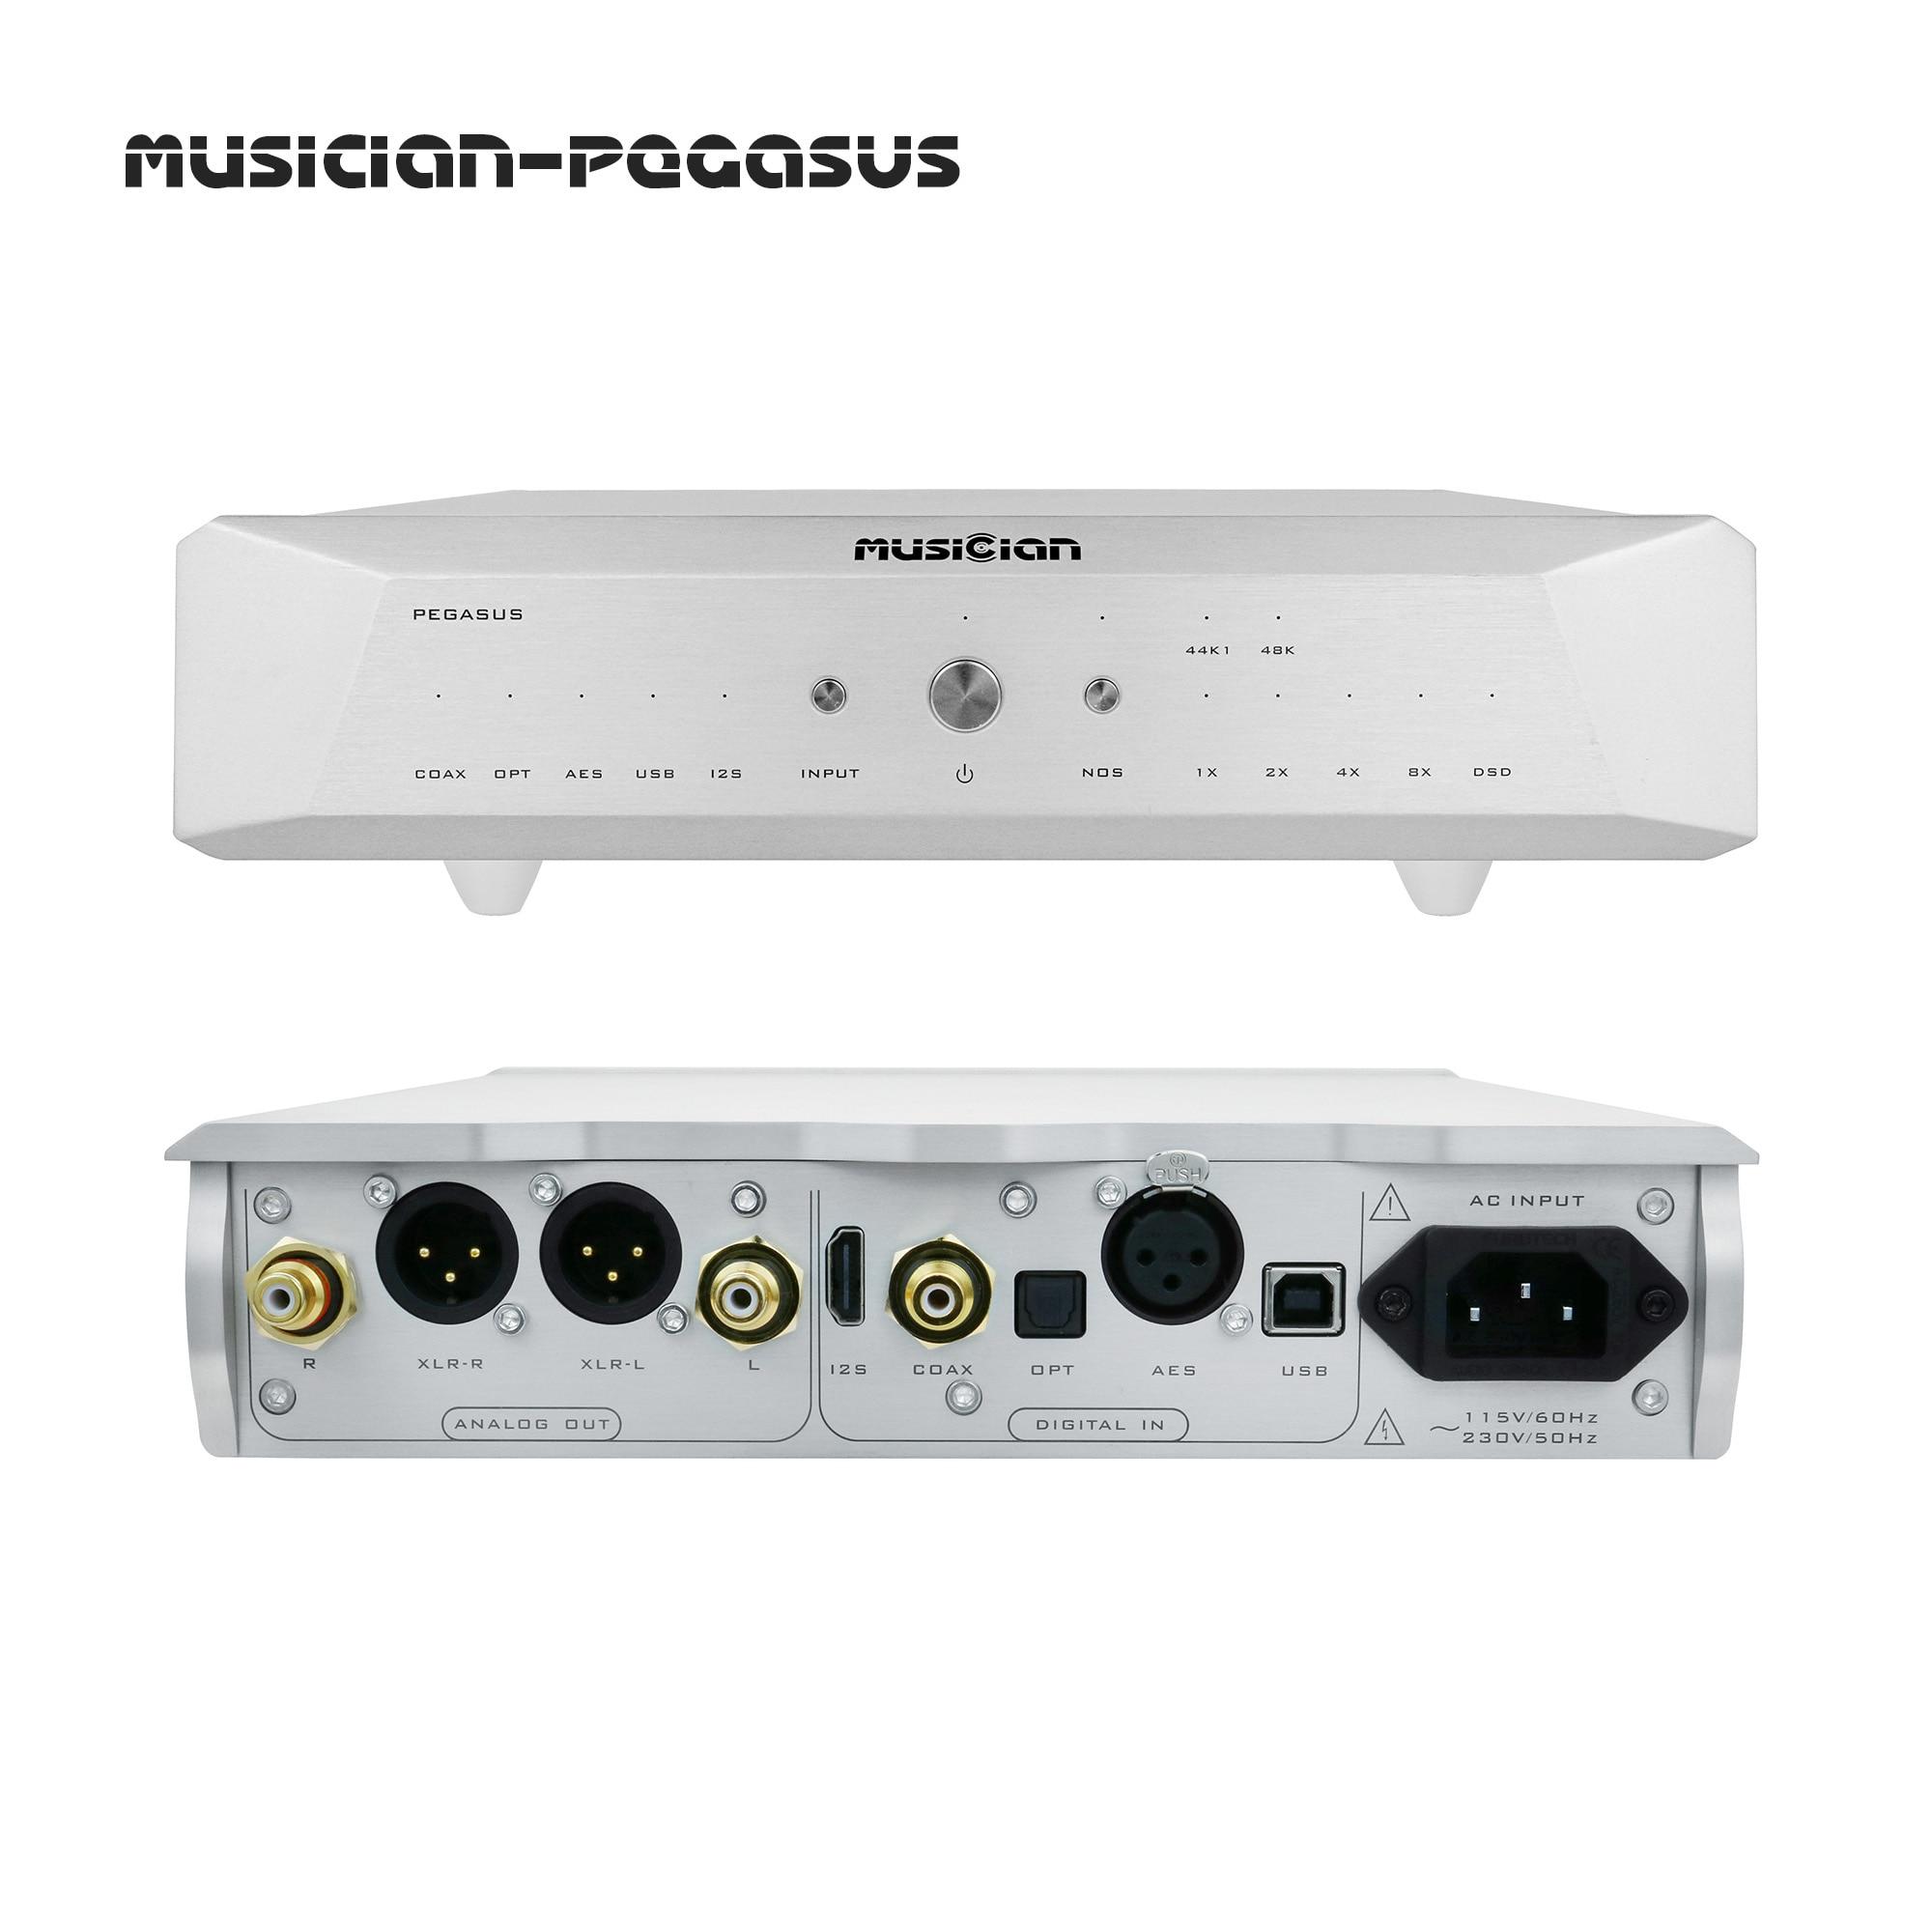 MUSICIAN PEGASUS 32Bit/1536kHz 24Bit R2R DAC 6BIT DSD Balanced Resistance DAC Support DSD1024 SPDIF Receiving Scheme R2R Decoder